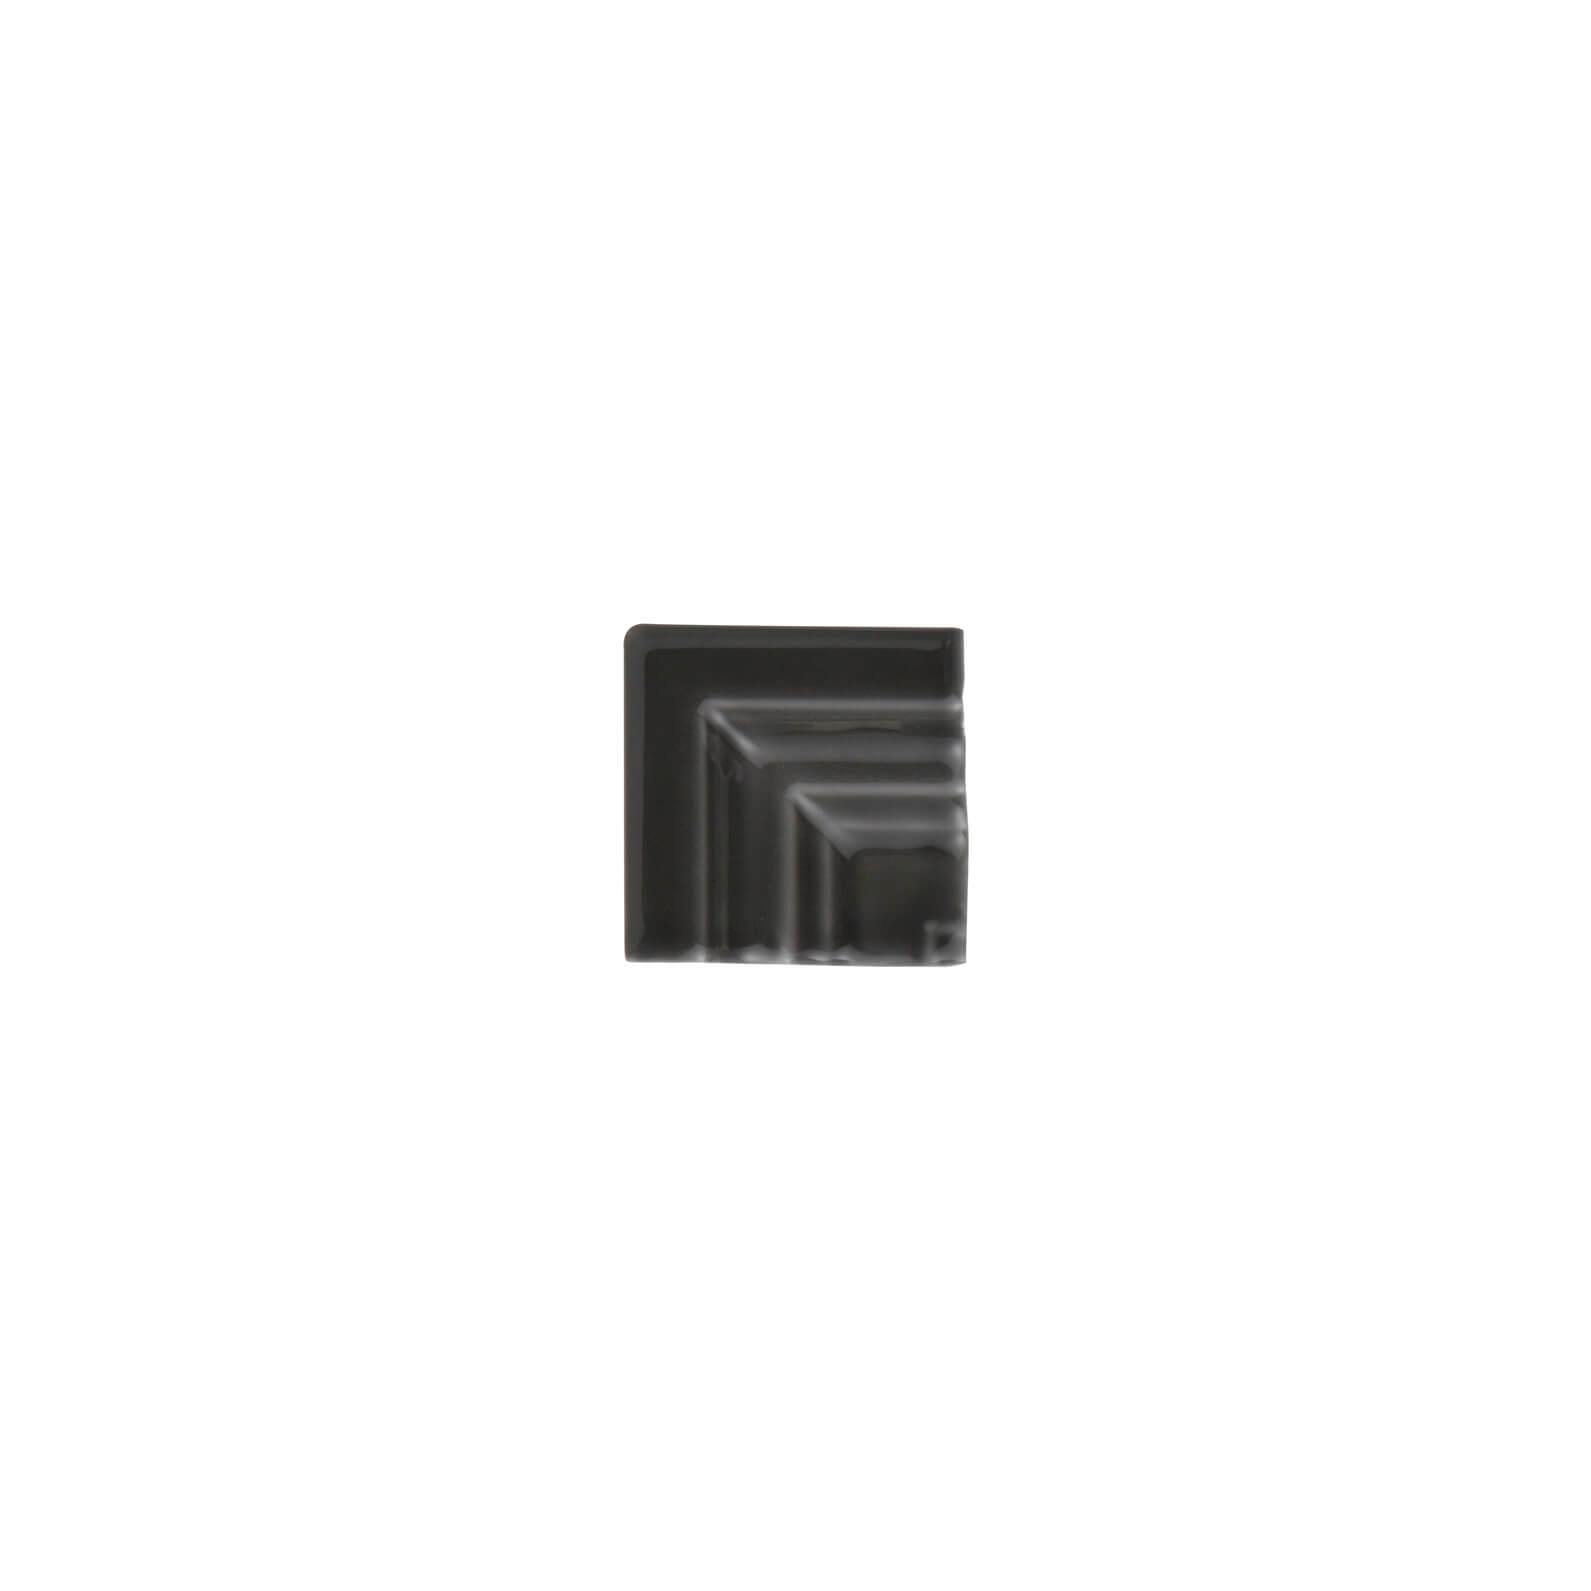 ADST5307 - ANGULO MARCO CORNISA - 5 cm X 19.8 cm